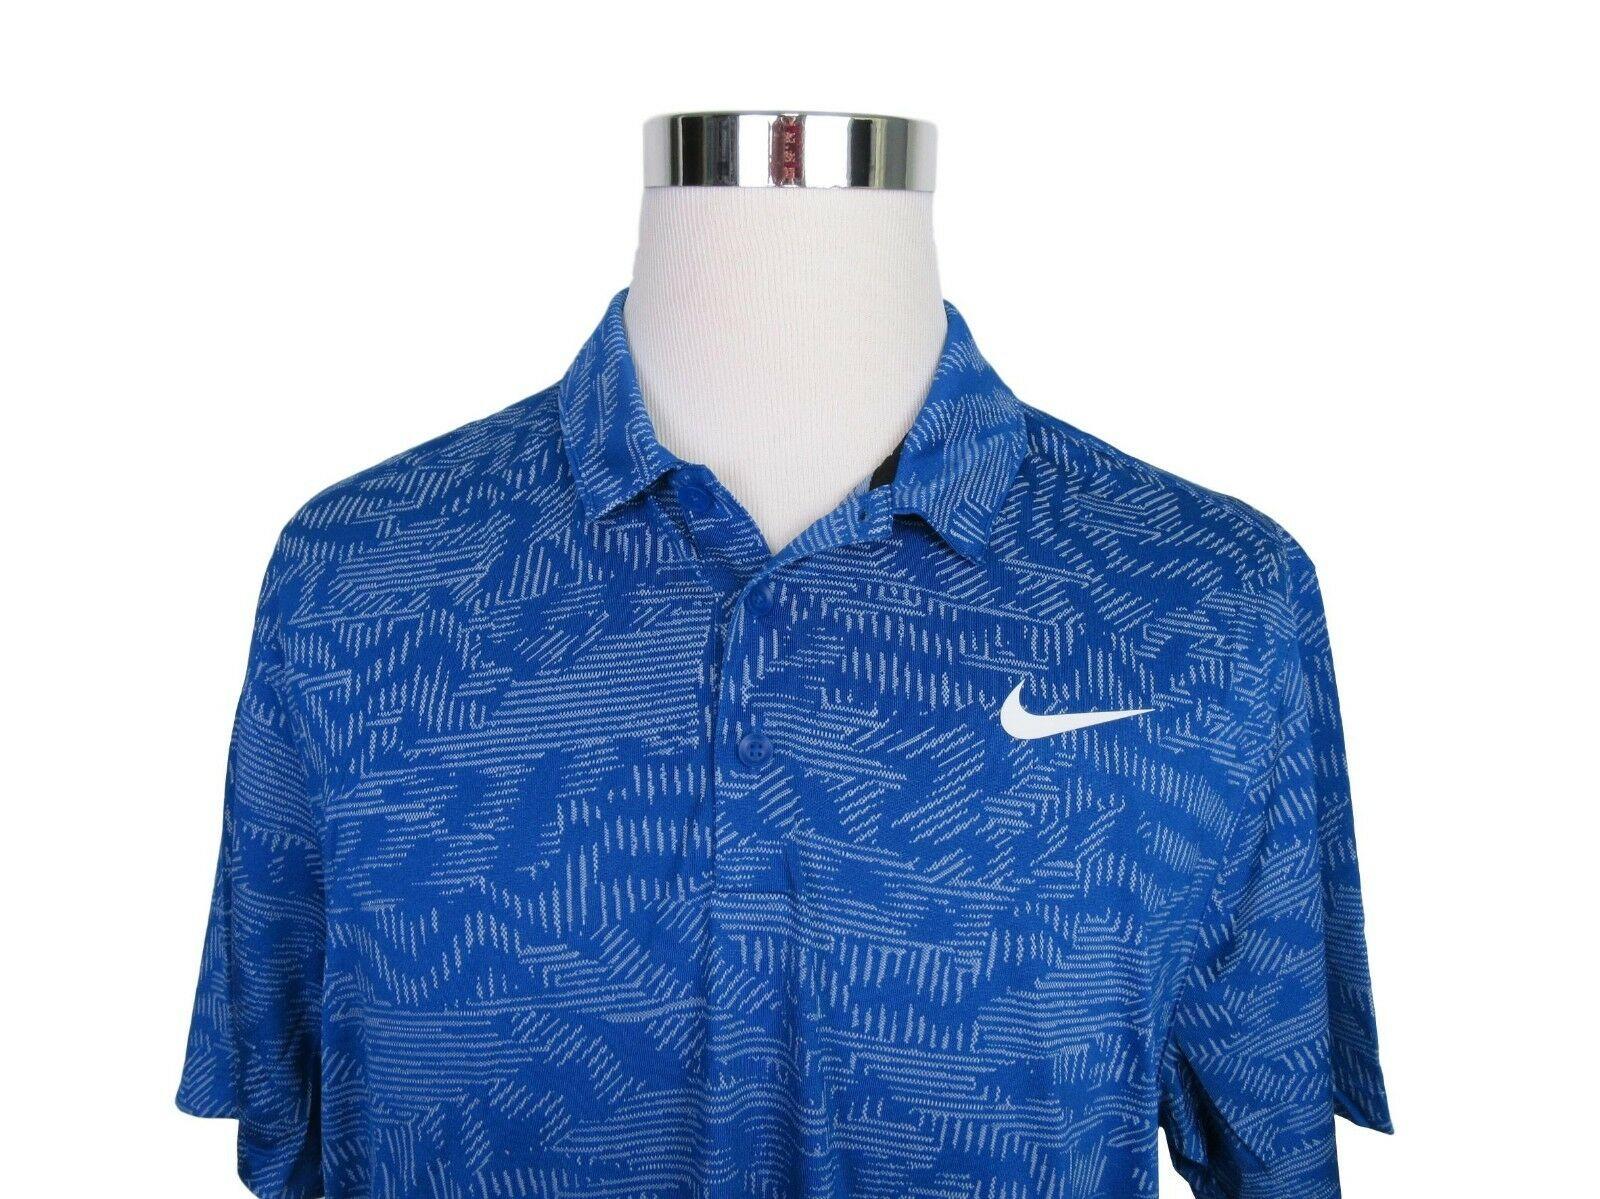 35a8bd43d Nike Golf Breathe Jacquard Blue Polo Shirt Size XL Men's Short Sleeve New  $70